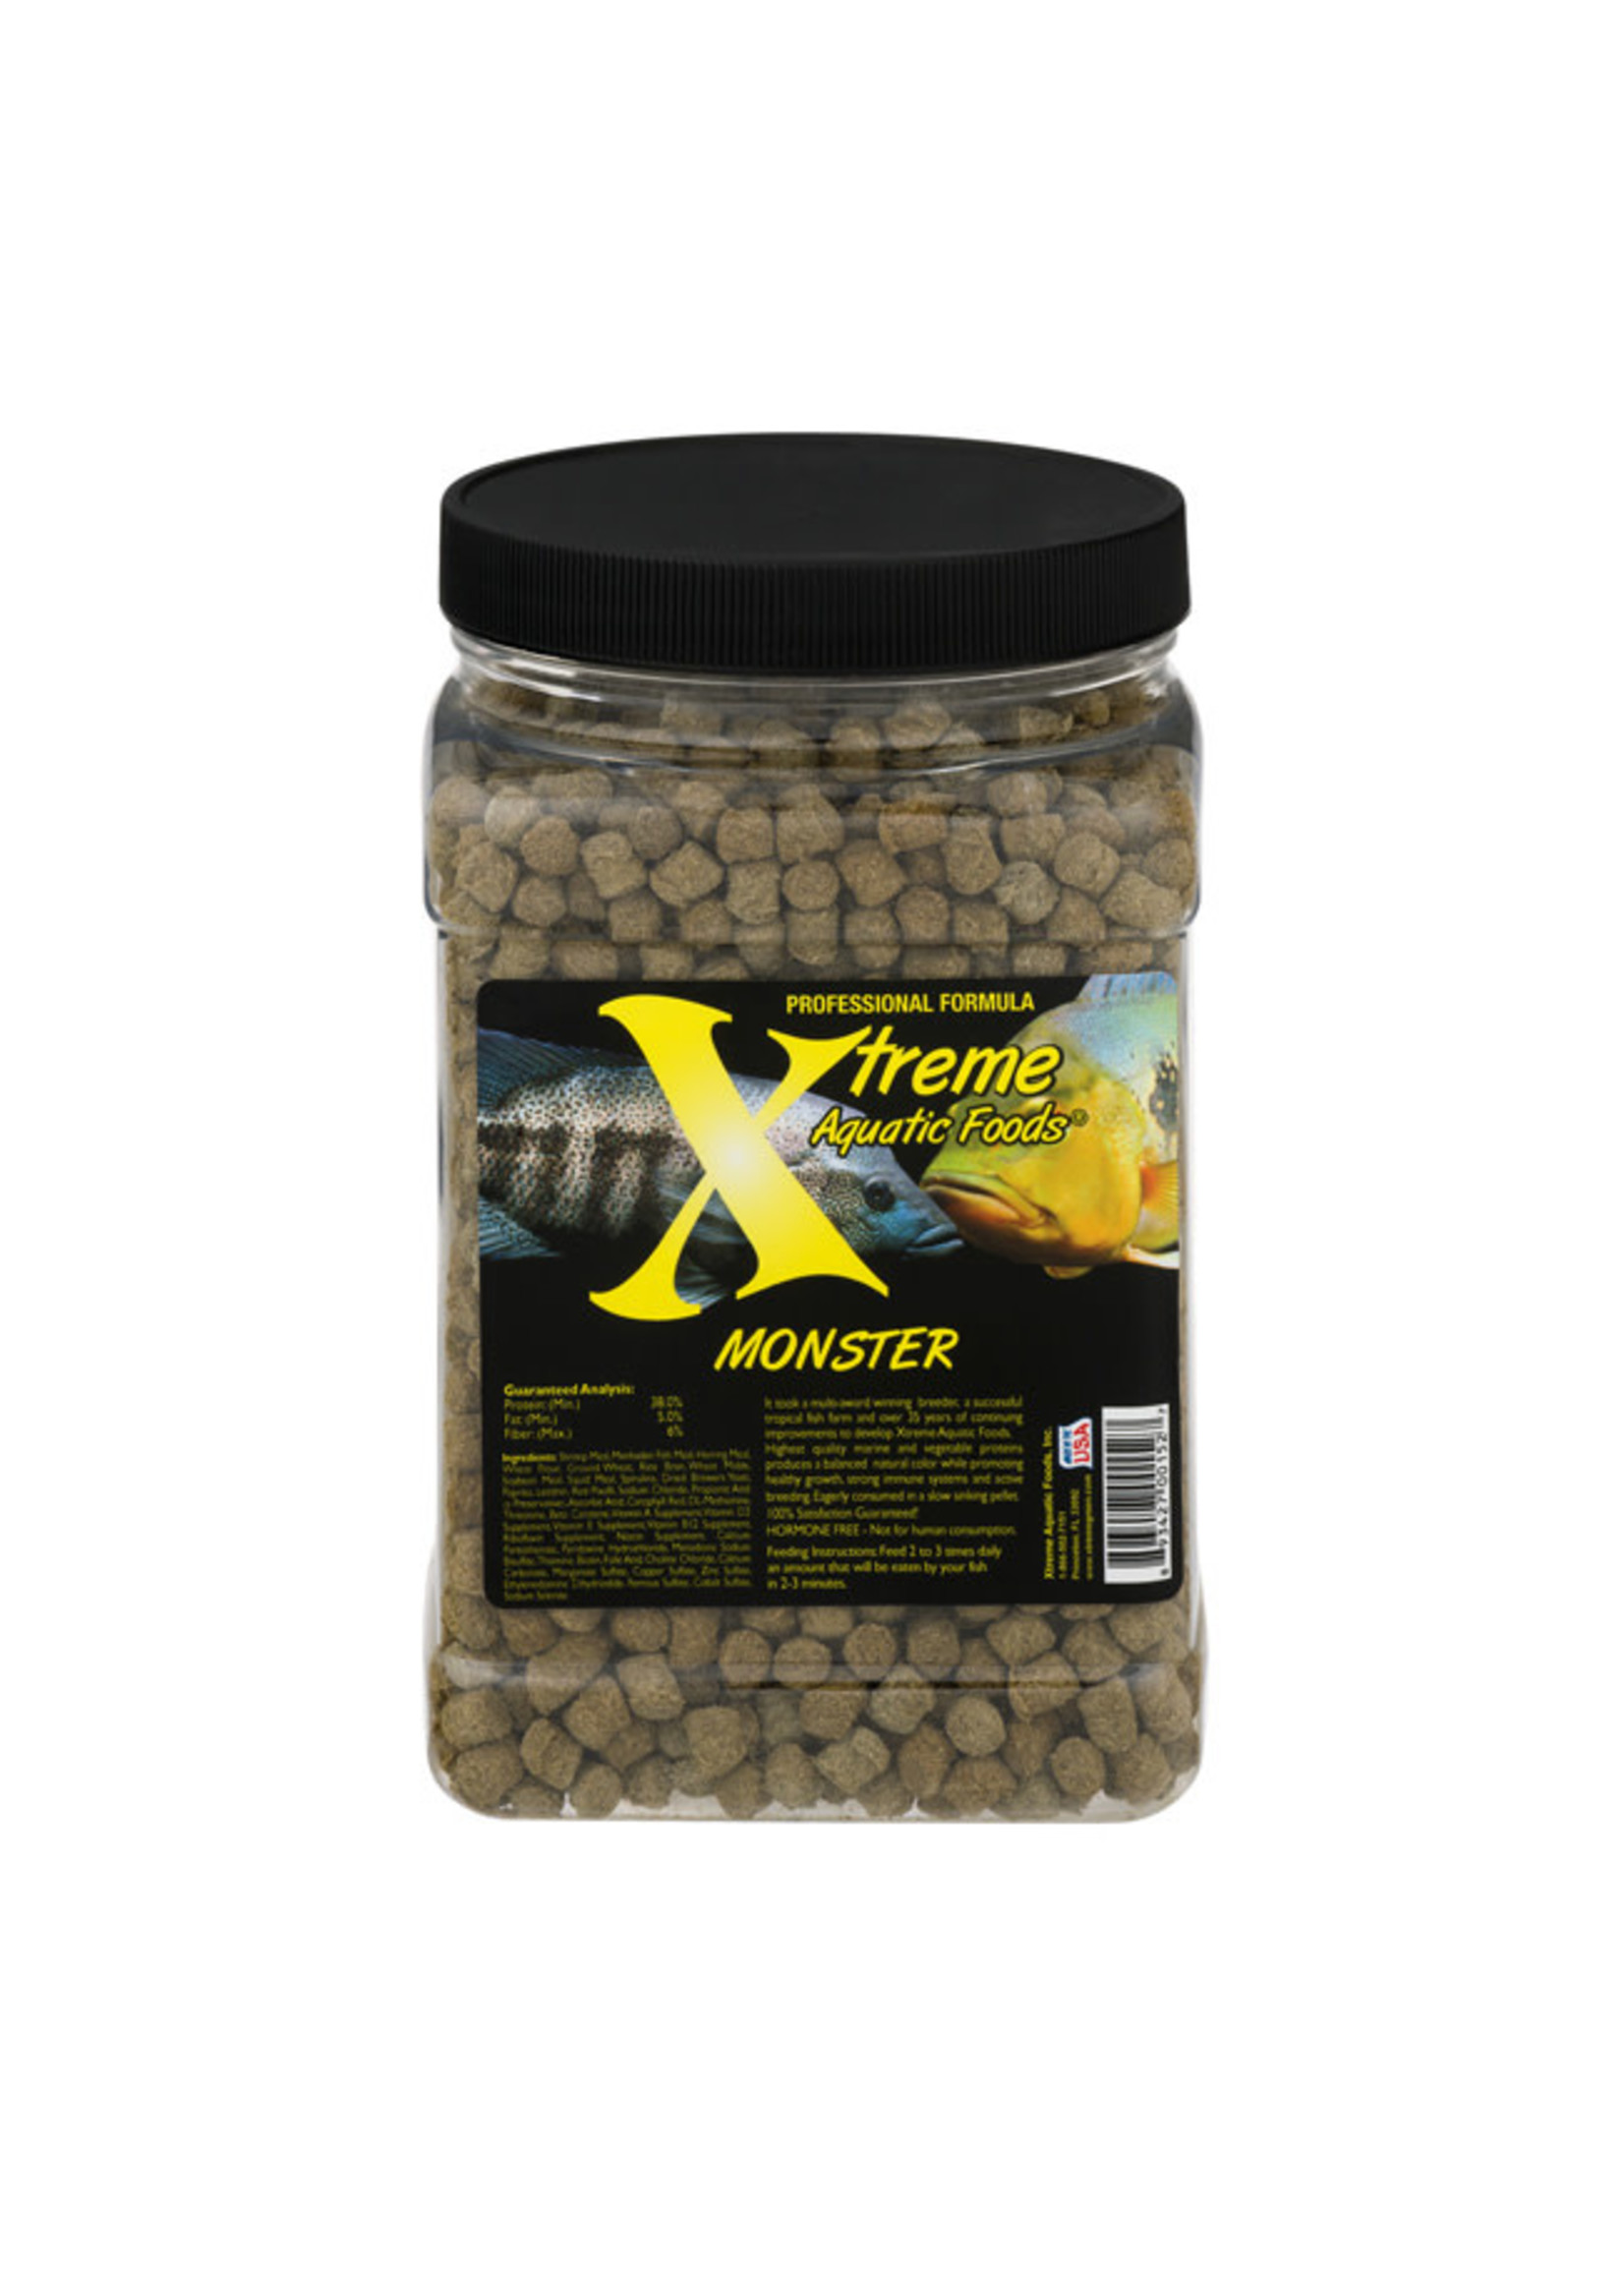 Xtreme Aquatic Foods Xtreme Monster Pellets 249g / 8.8oz